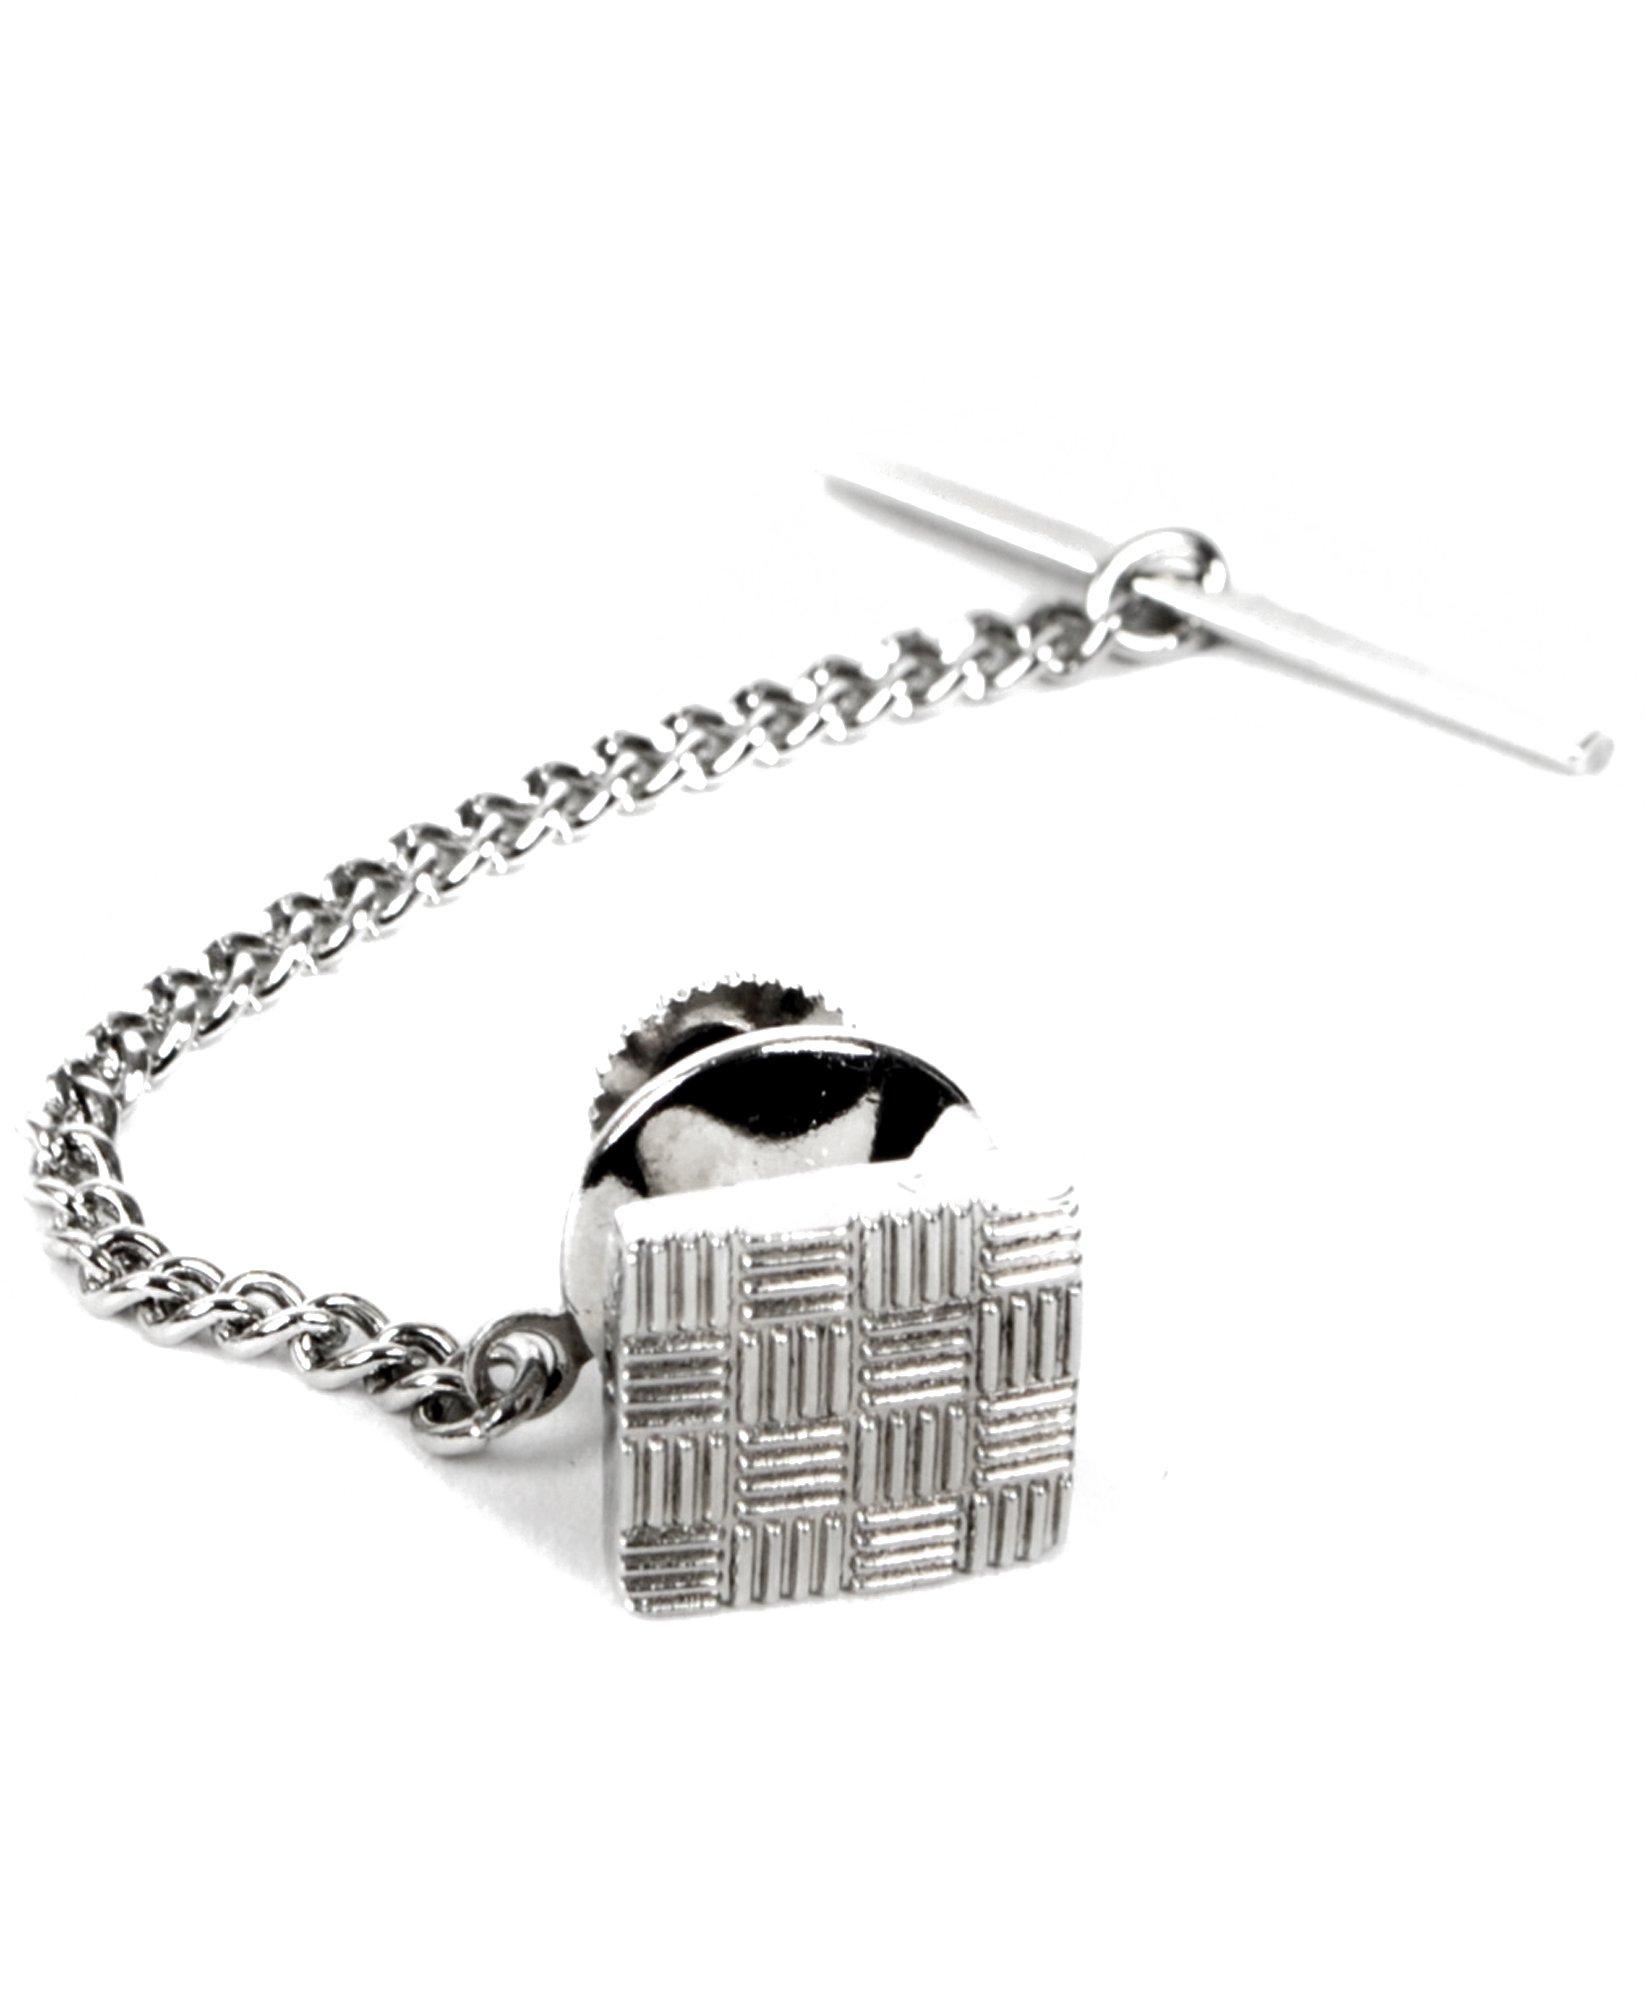 Patchwork Premium Tie Tack (Silver)